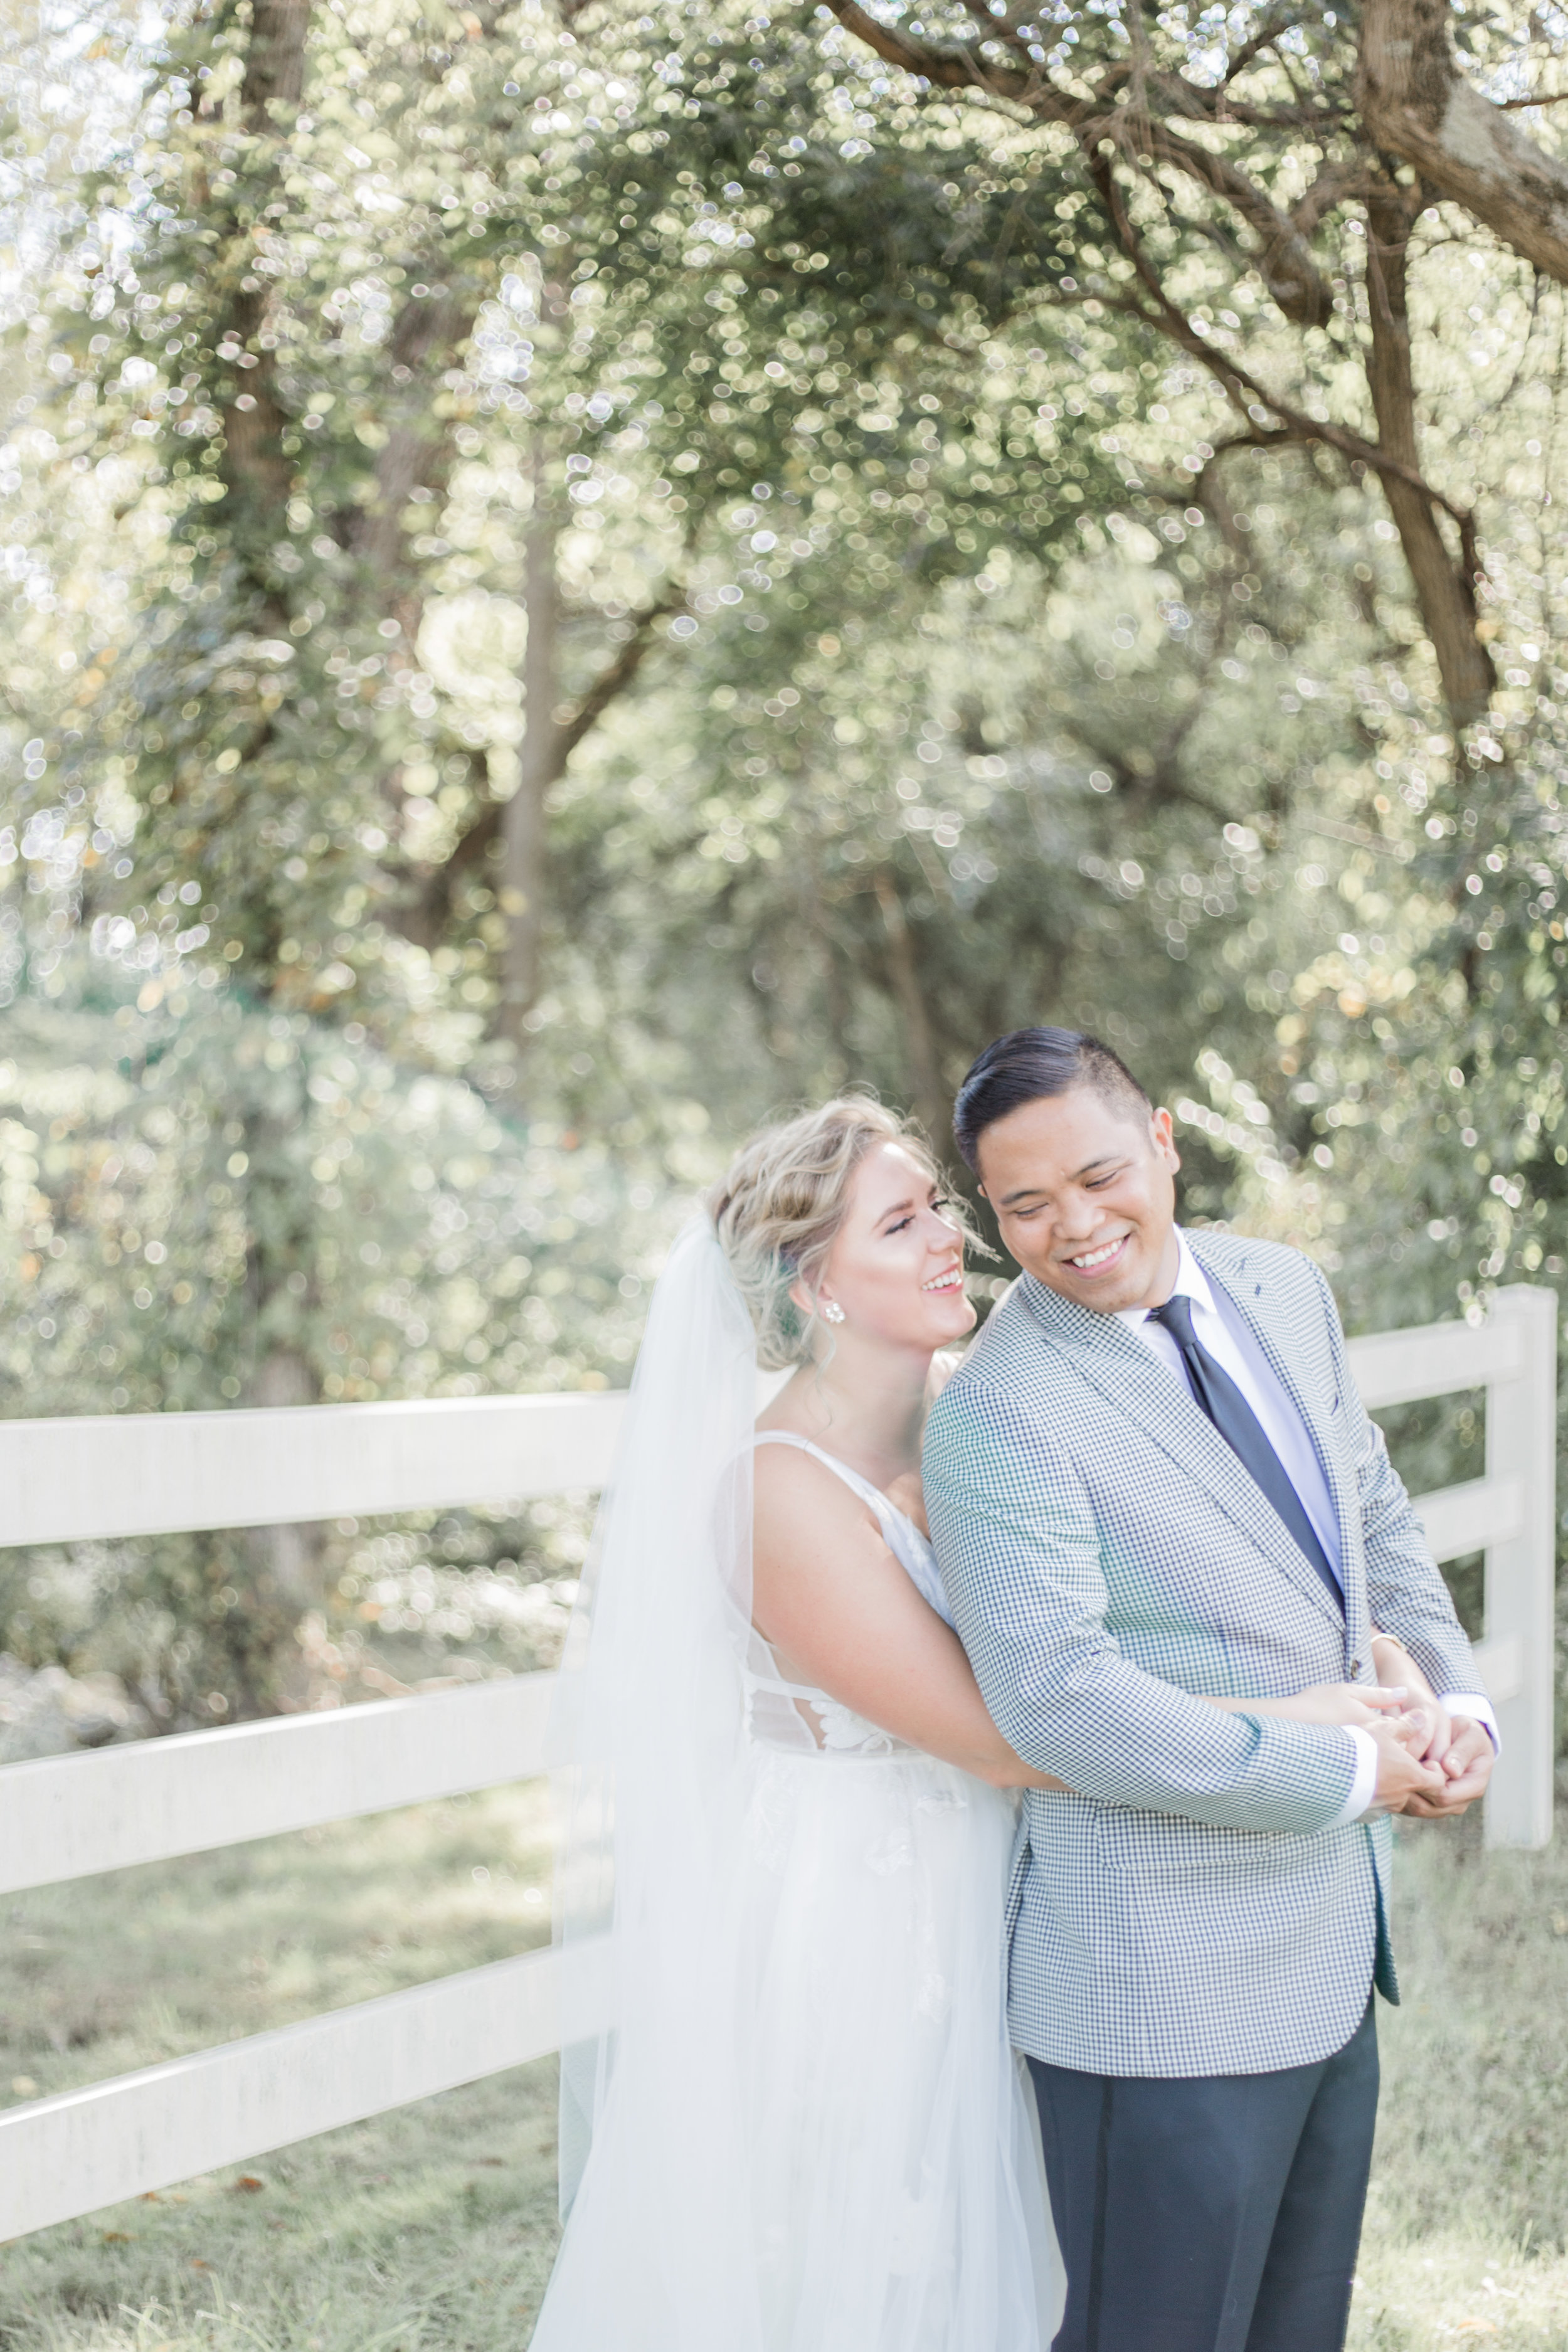 Autumn and Ryan Wedding FAVS HR-3.jpg